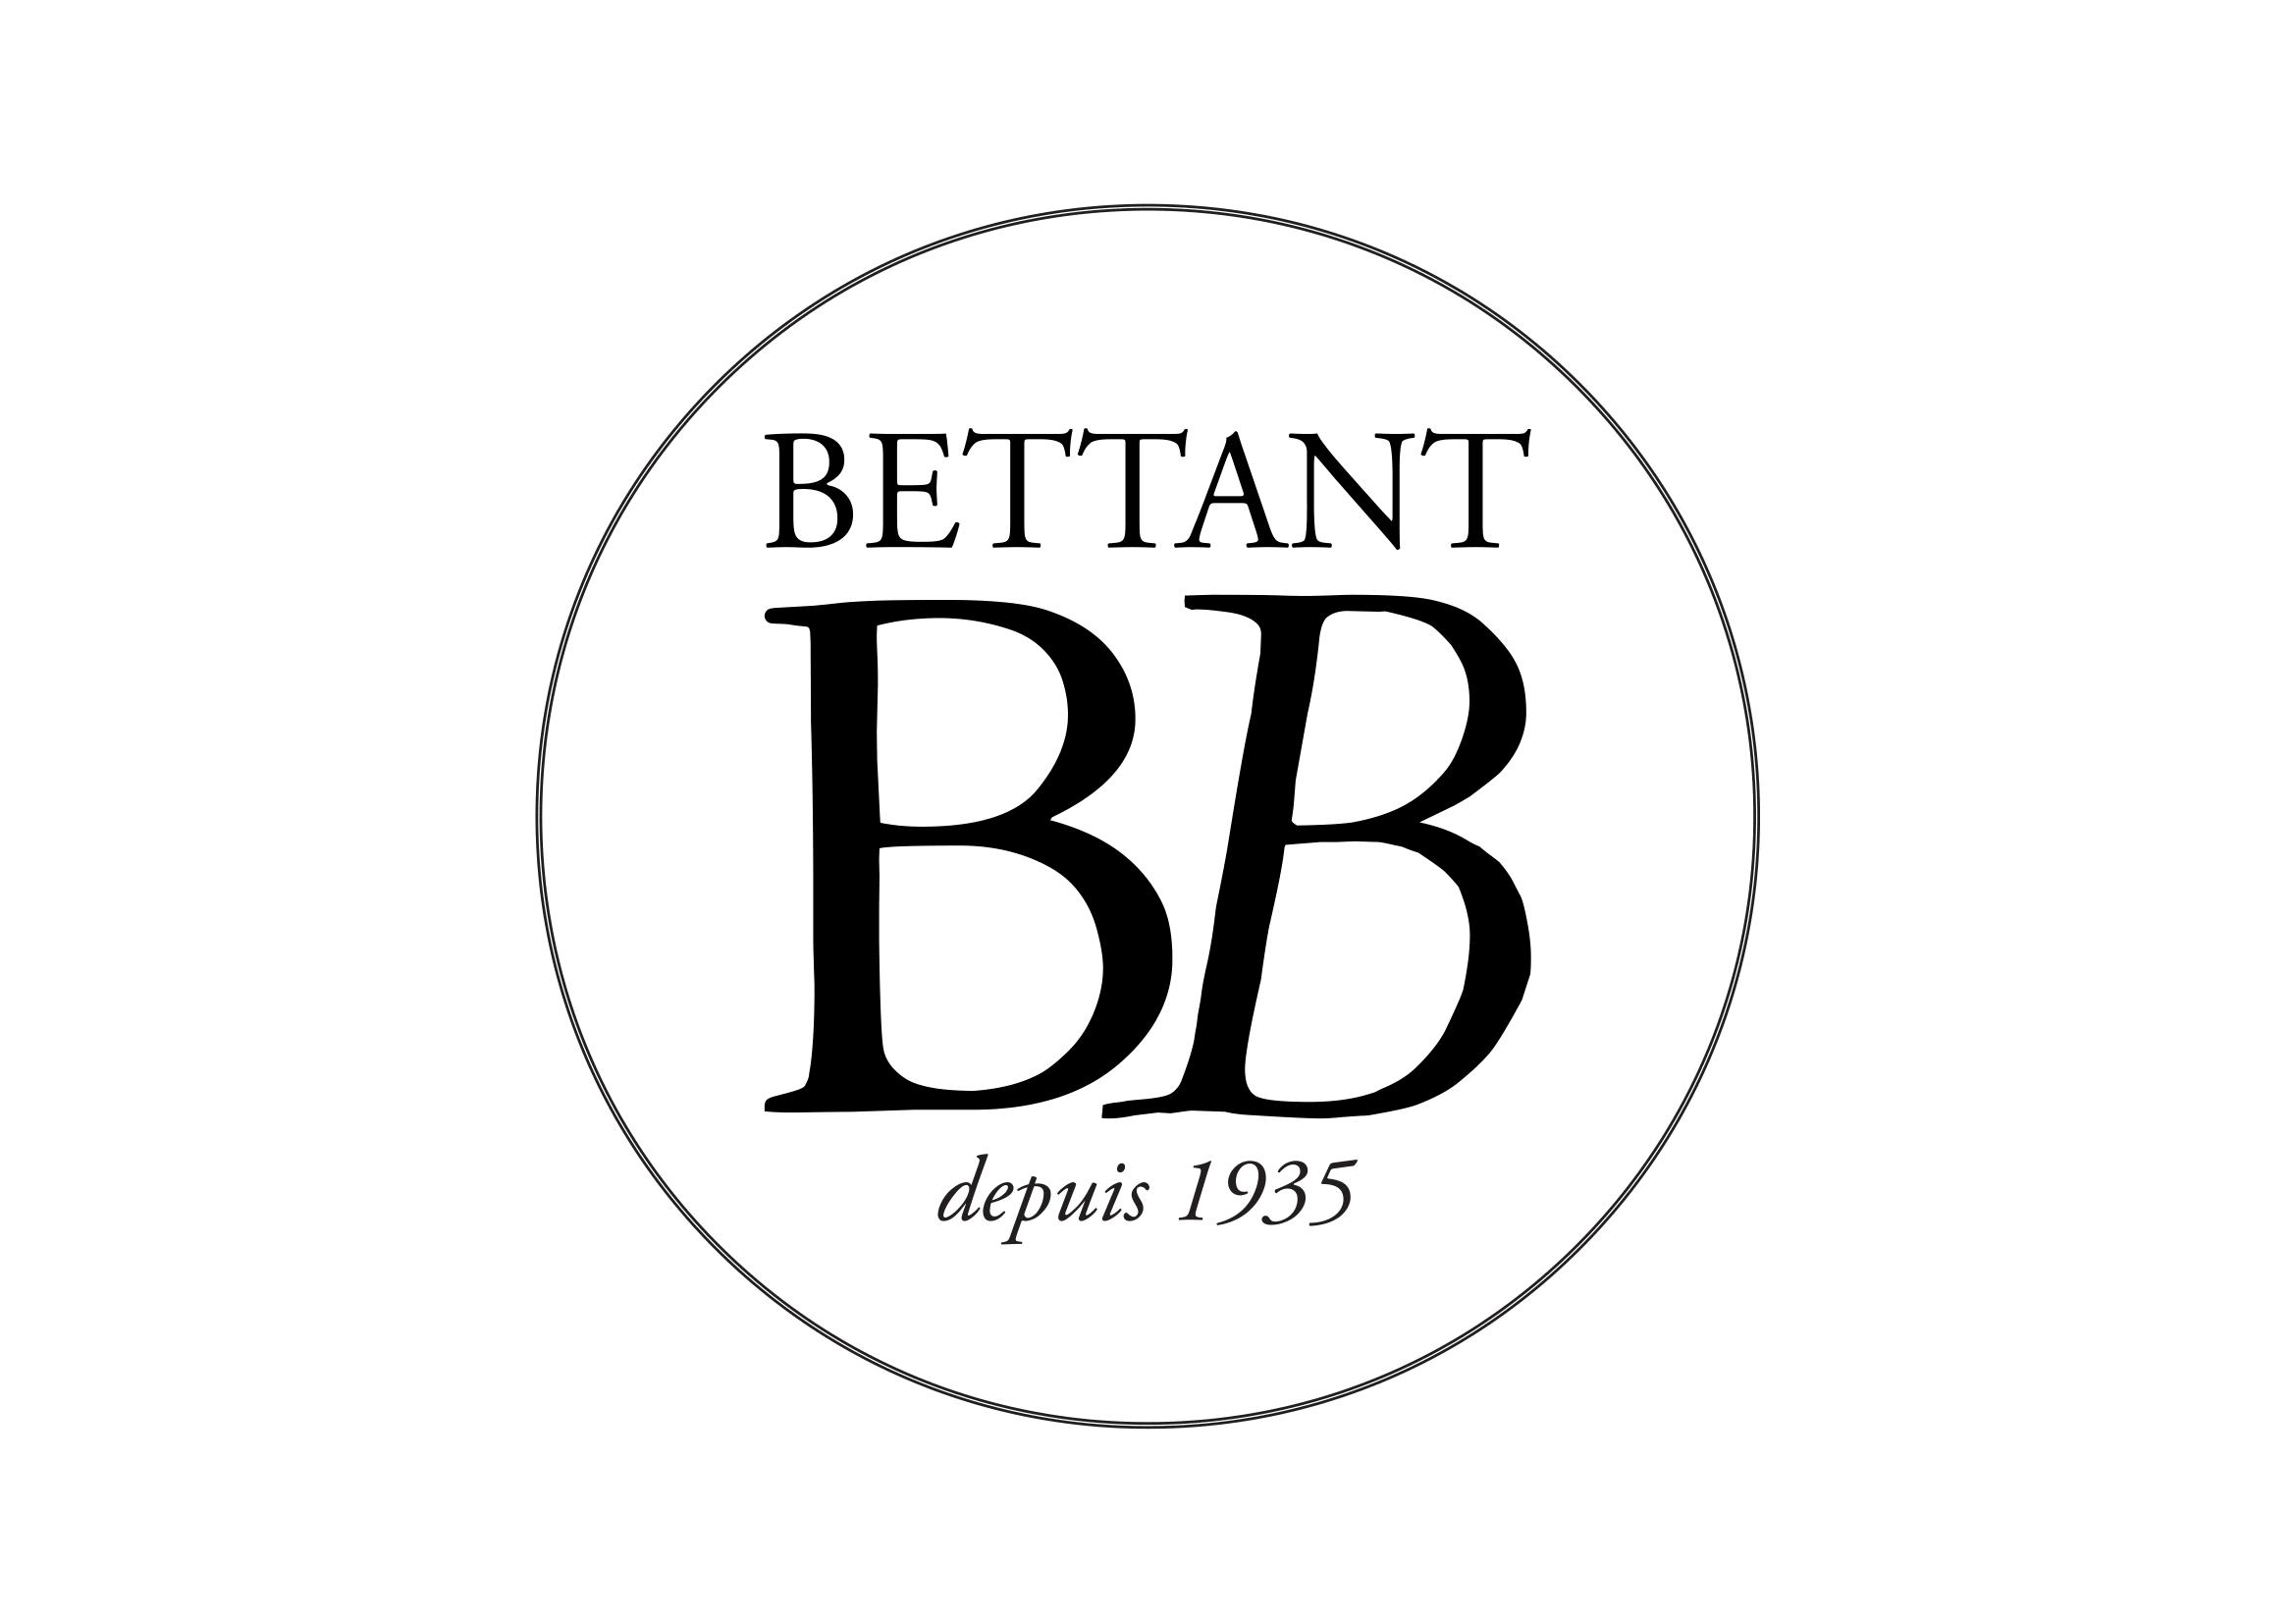 bettant